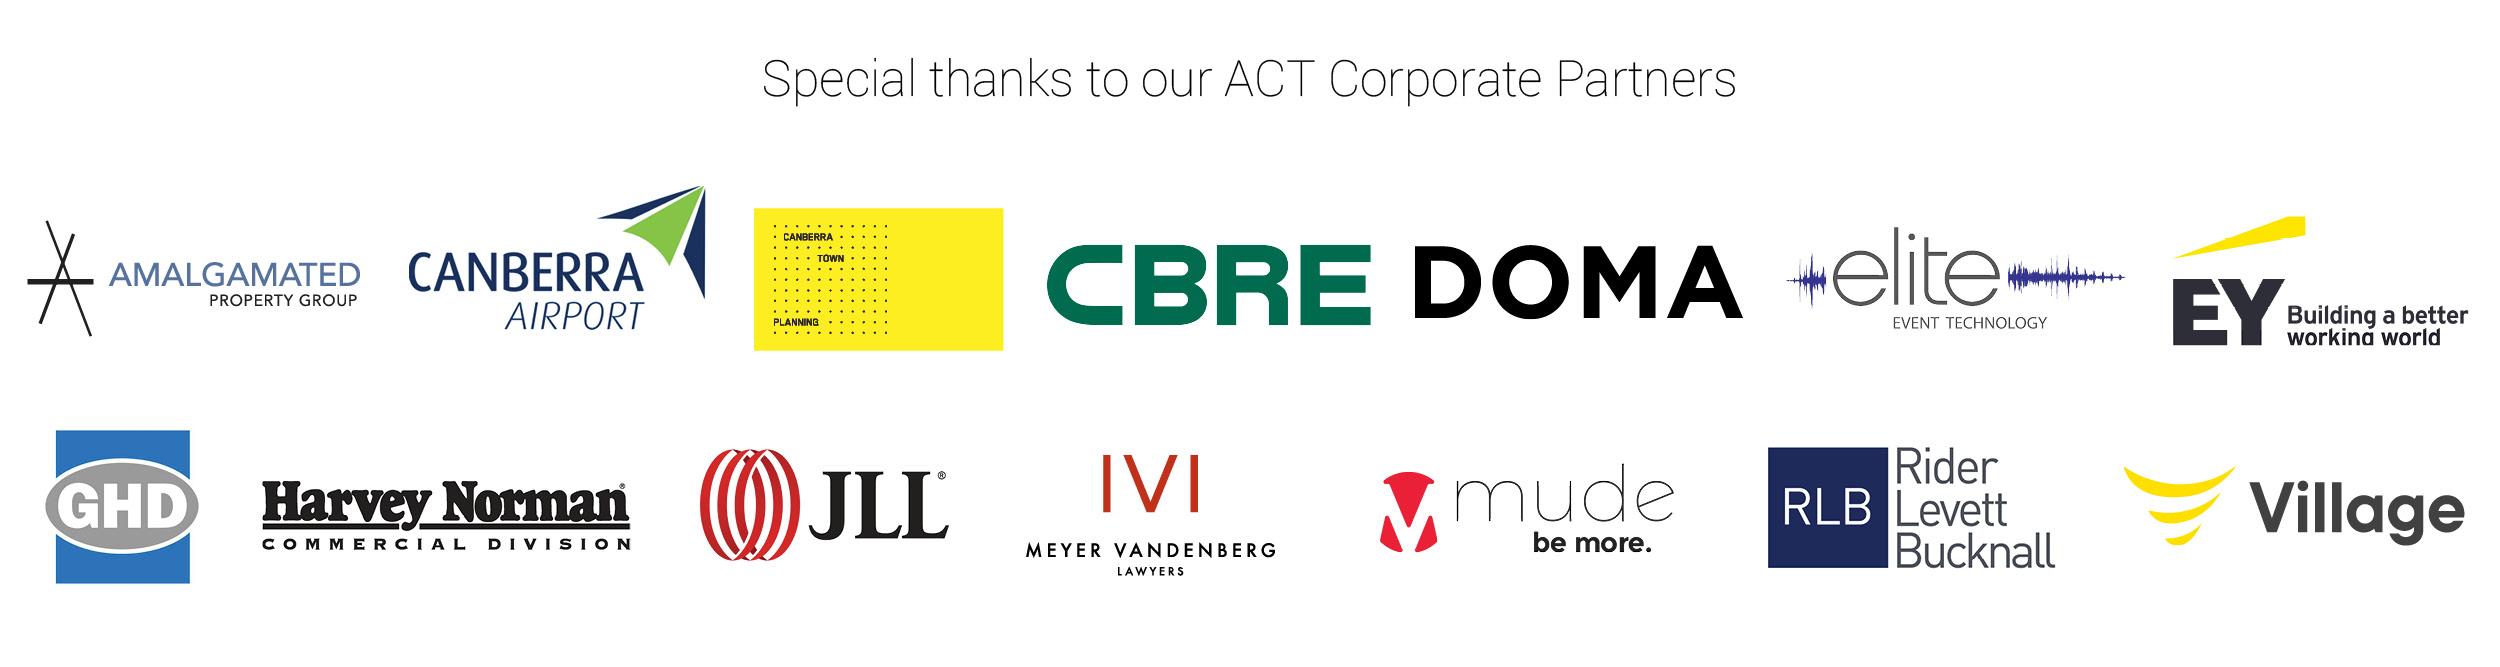 Corporate partner JUNE 19 sig